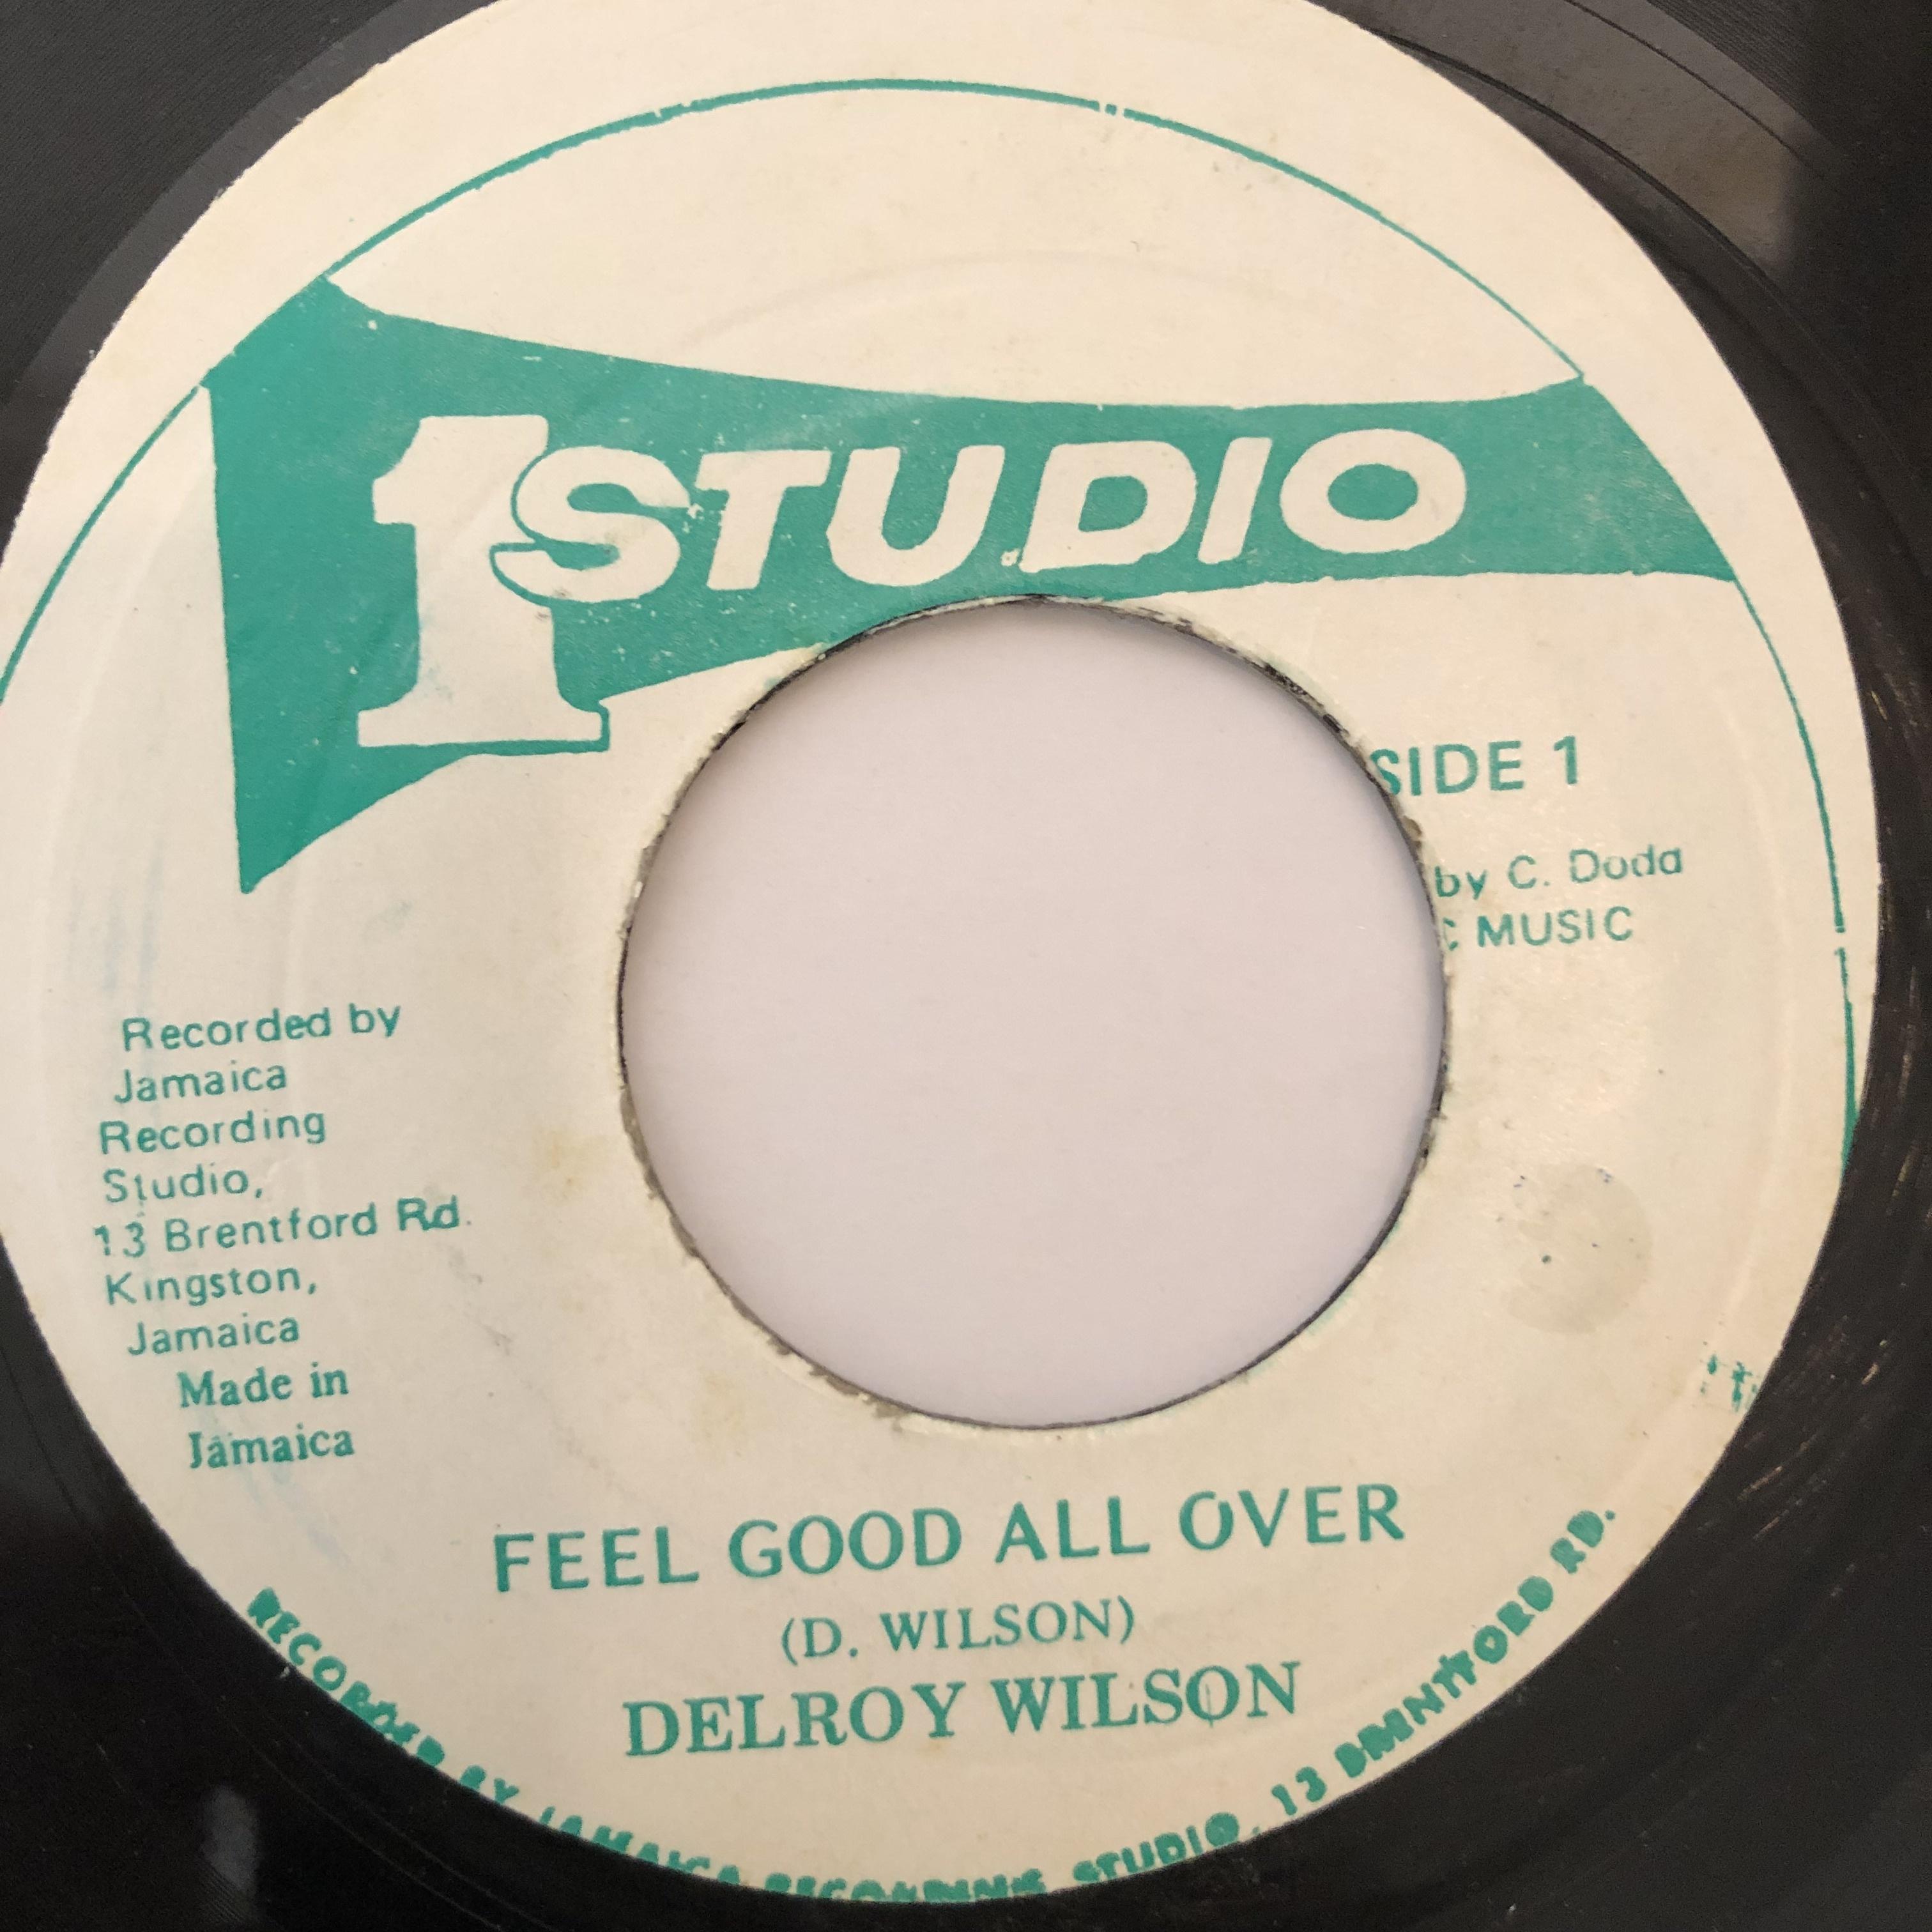 Delroy Wilson(ディロイウィルソン) - Feel Good All Over【7-20241】